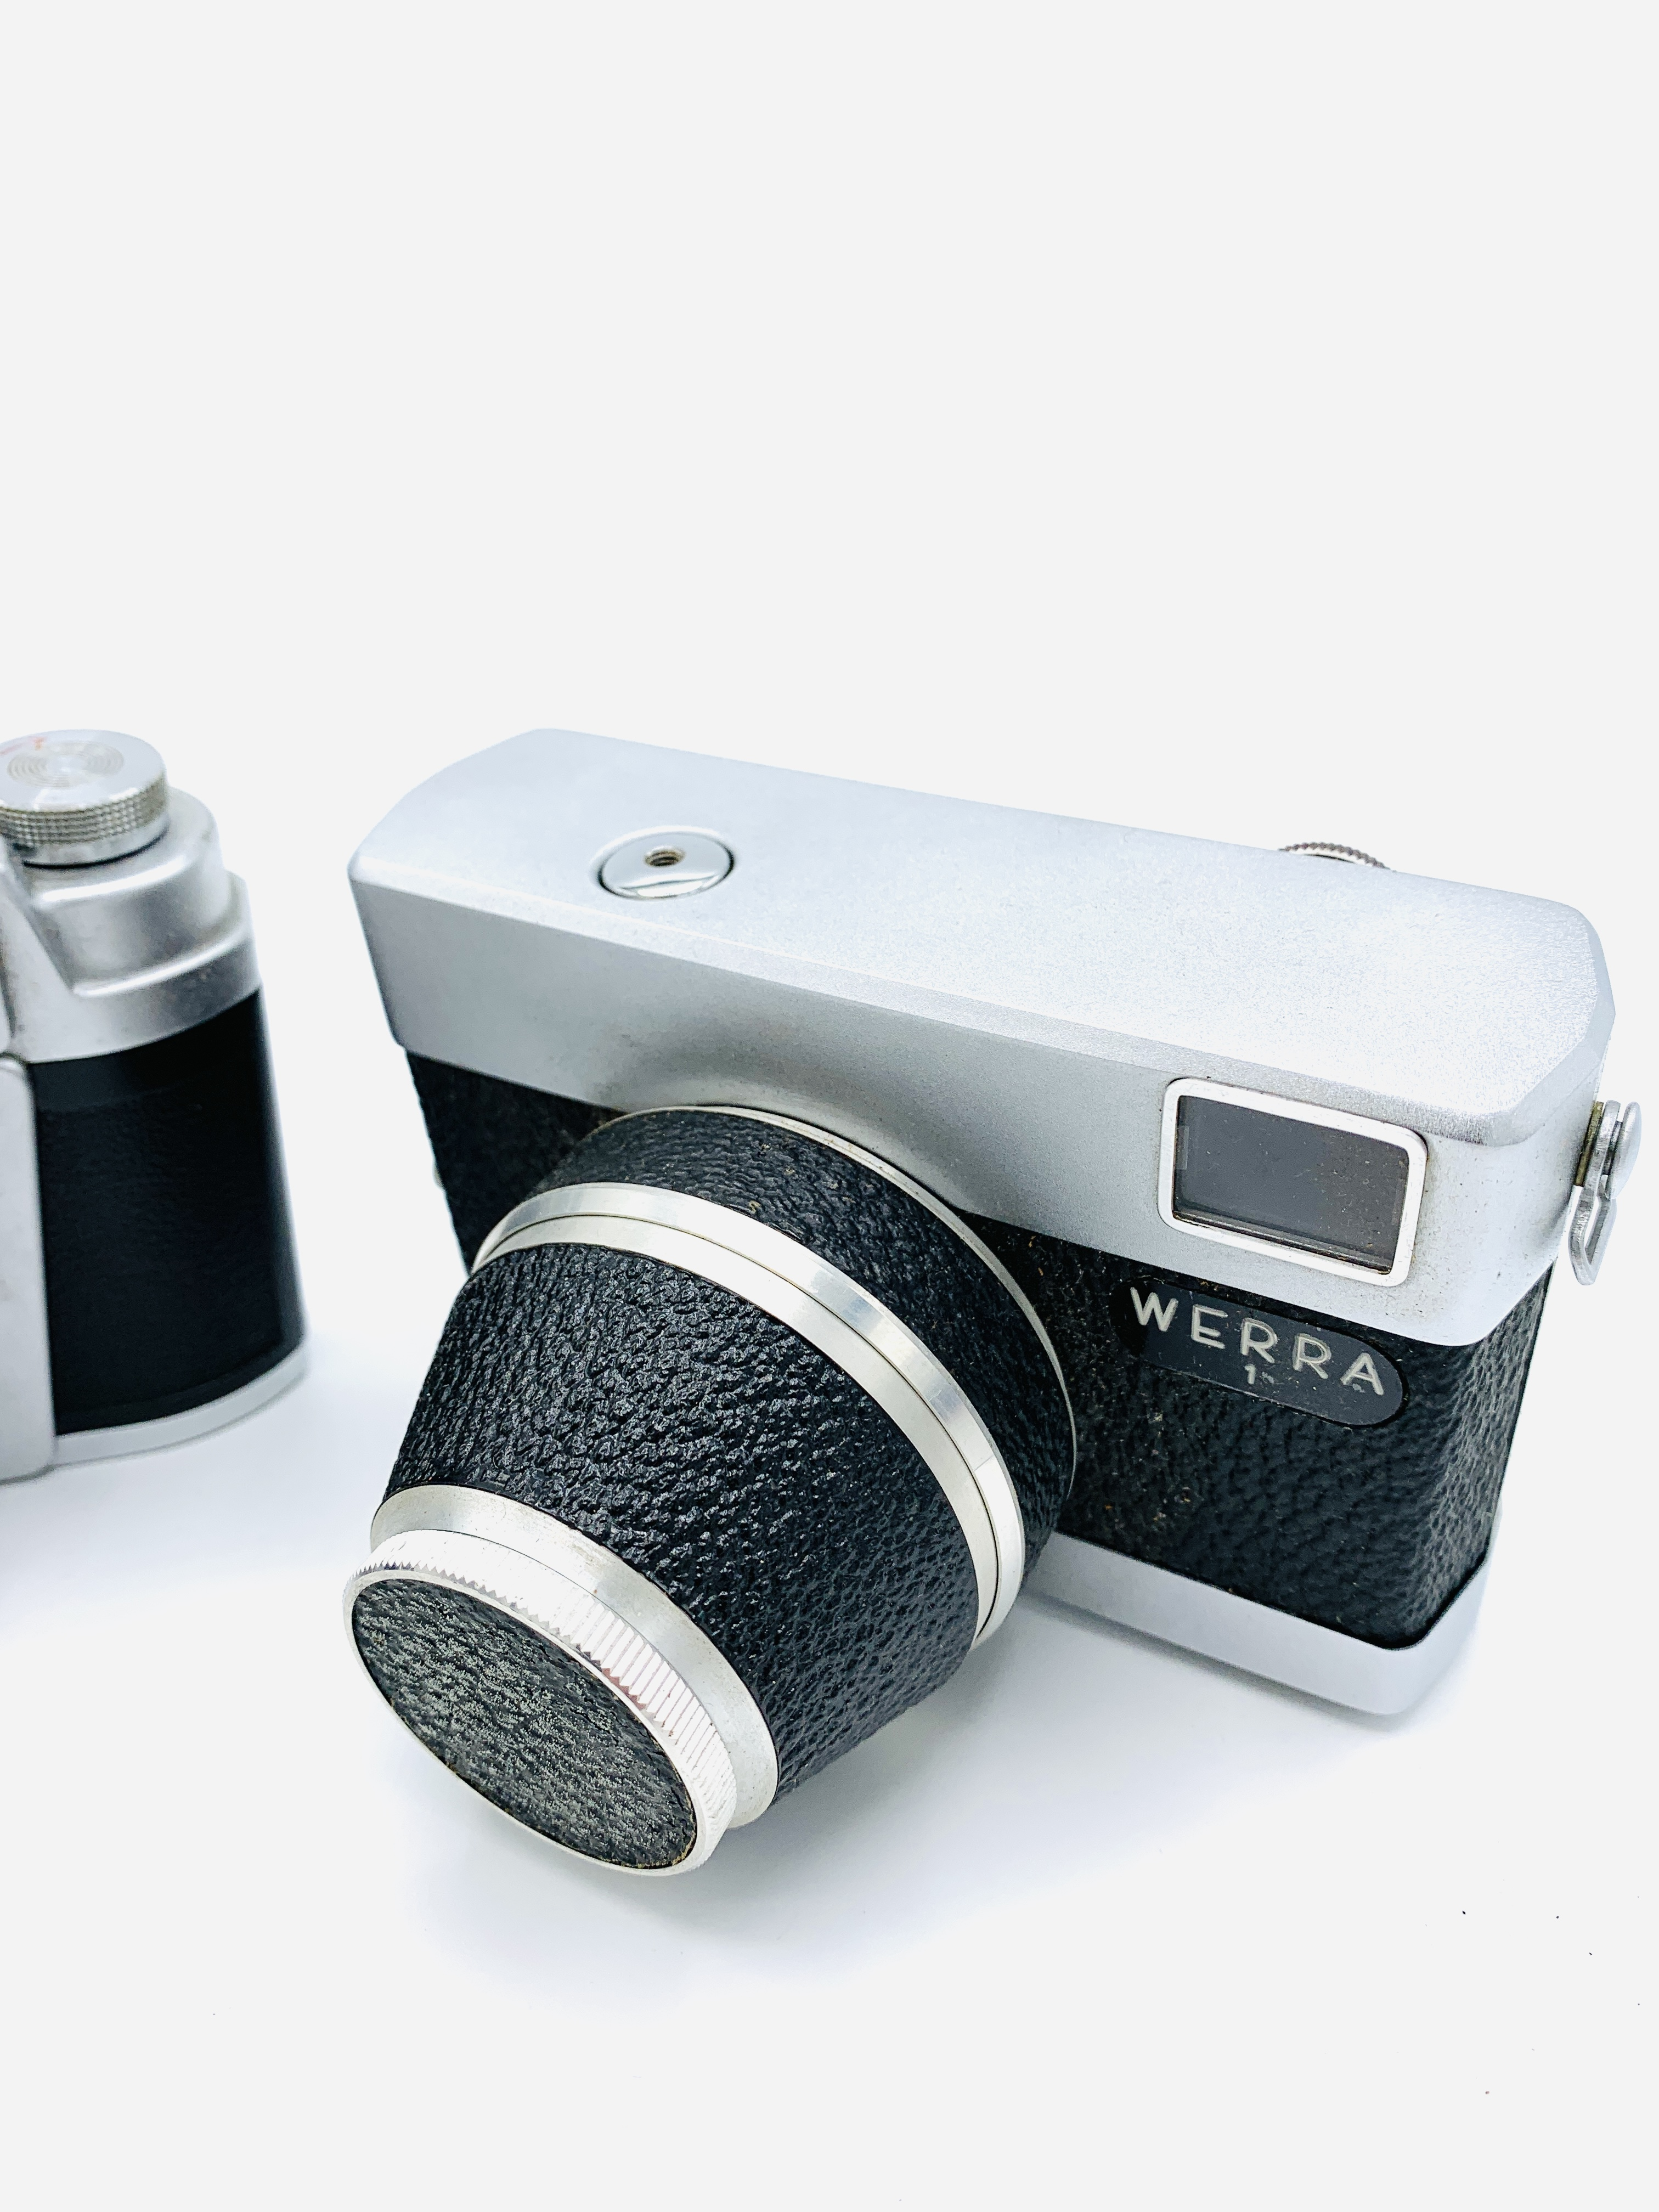 Leidolf, Wetzlar, Lordomat SLE camera, together with a Werra 1 camera - Image 3 of 4